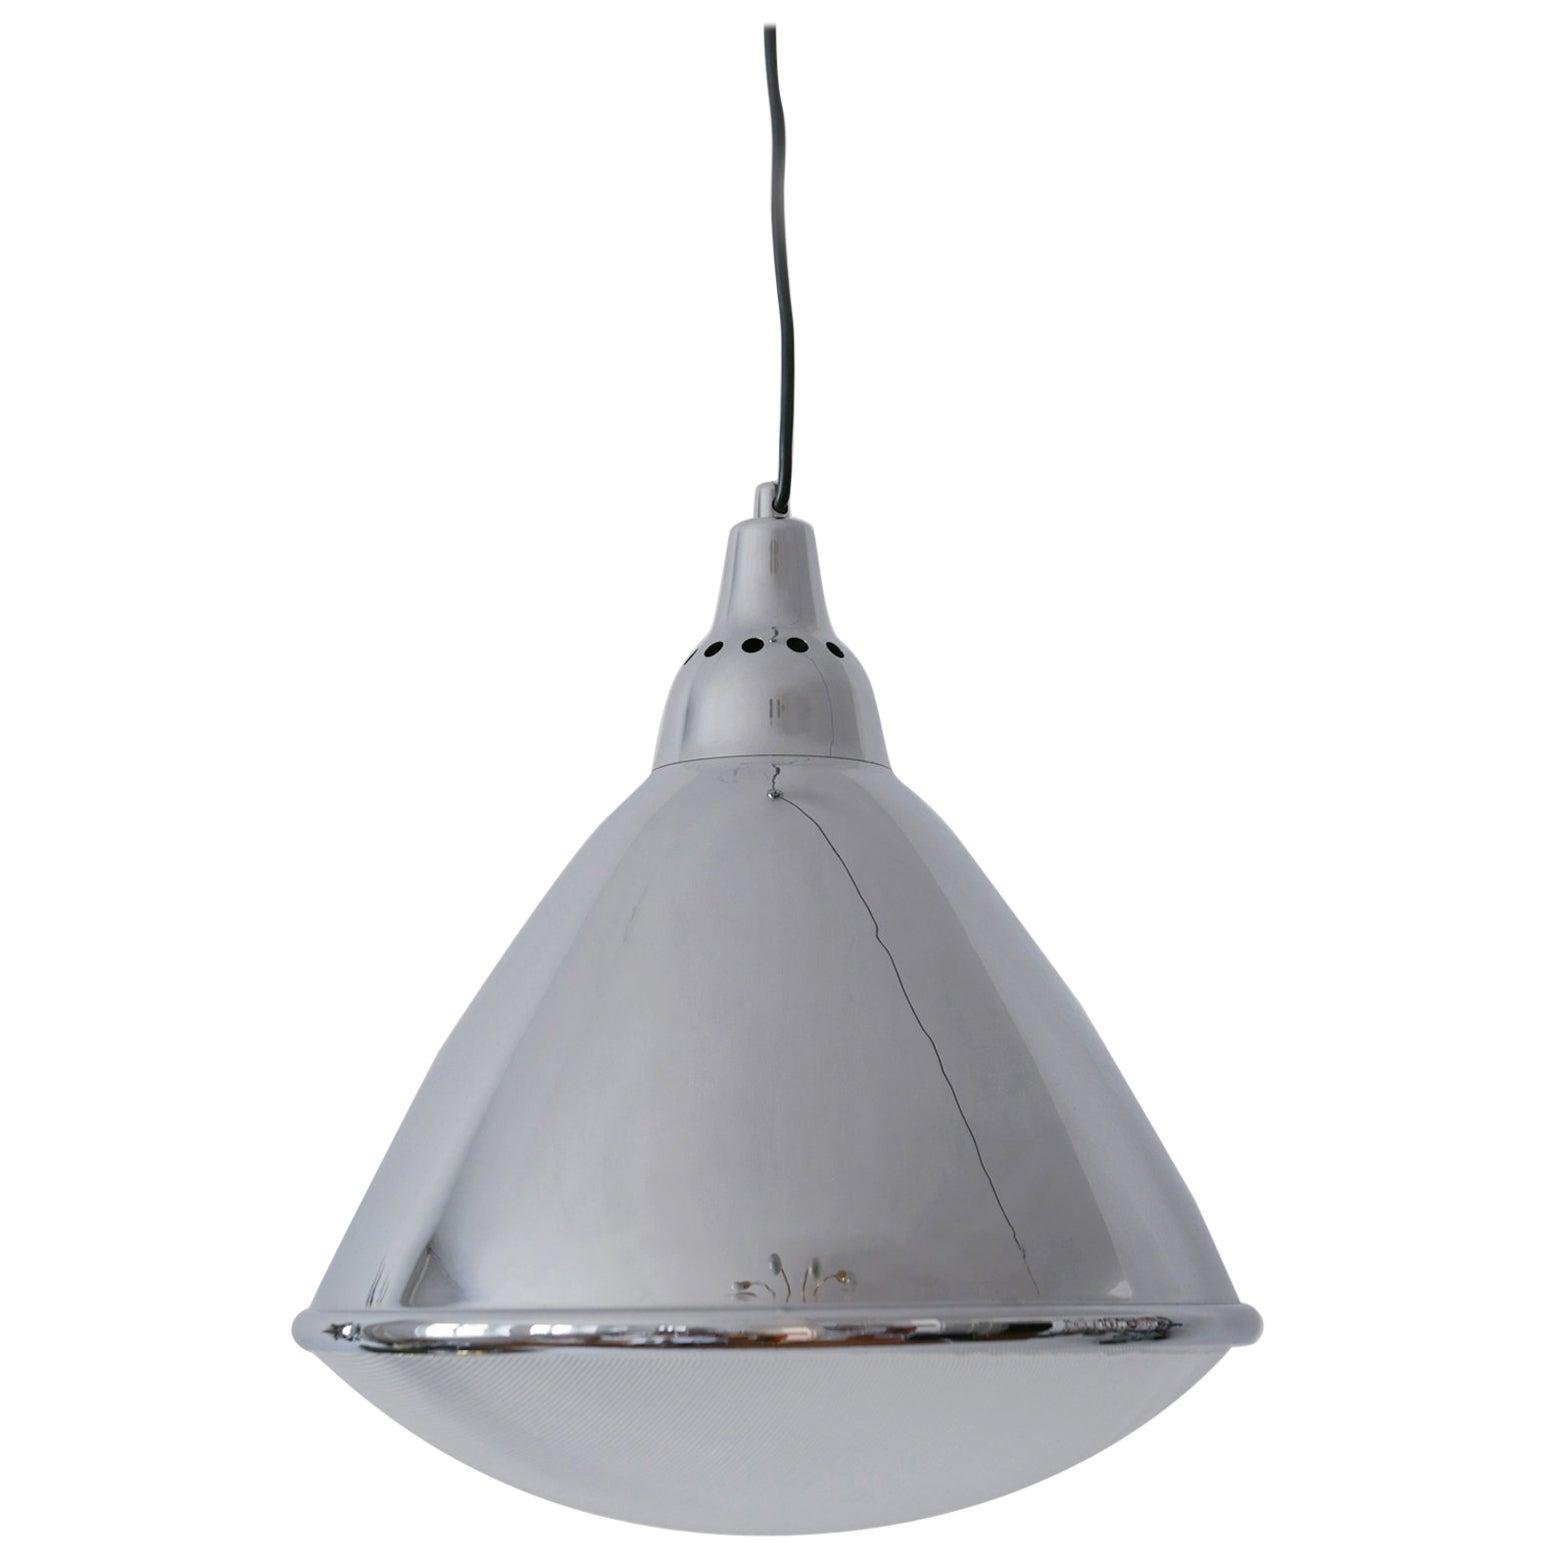 Midcentury 'Headlight' Pendant Lamp by Ingo Maurer for Design M, 1968, Germany